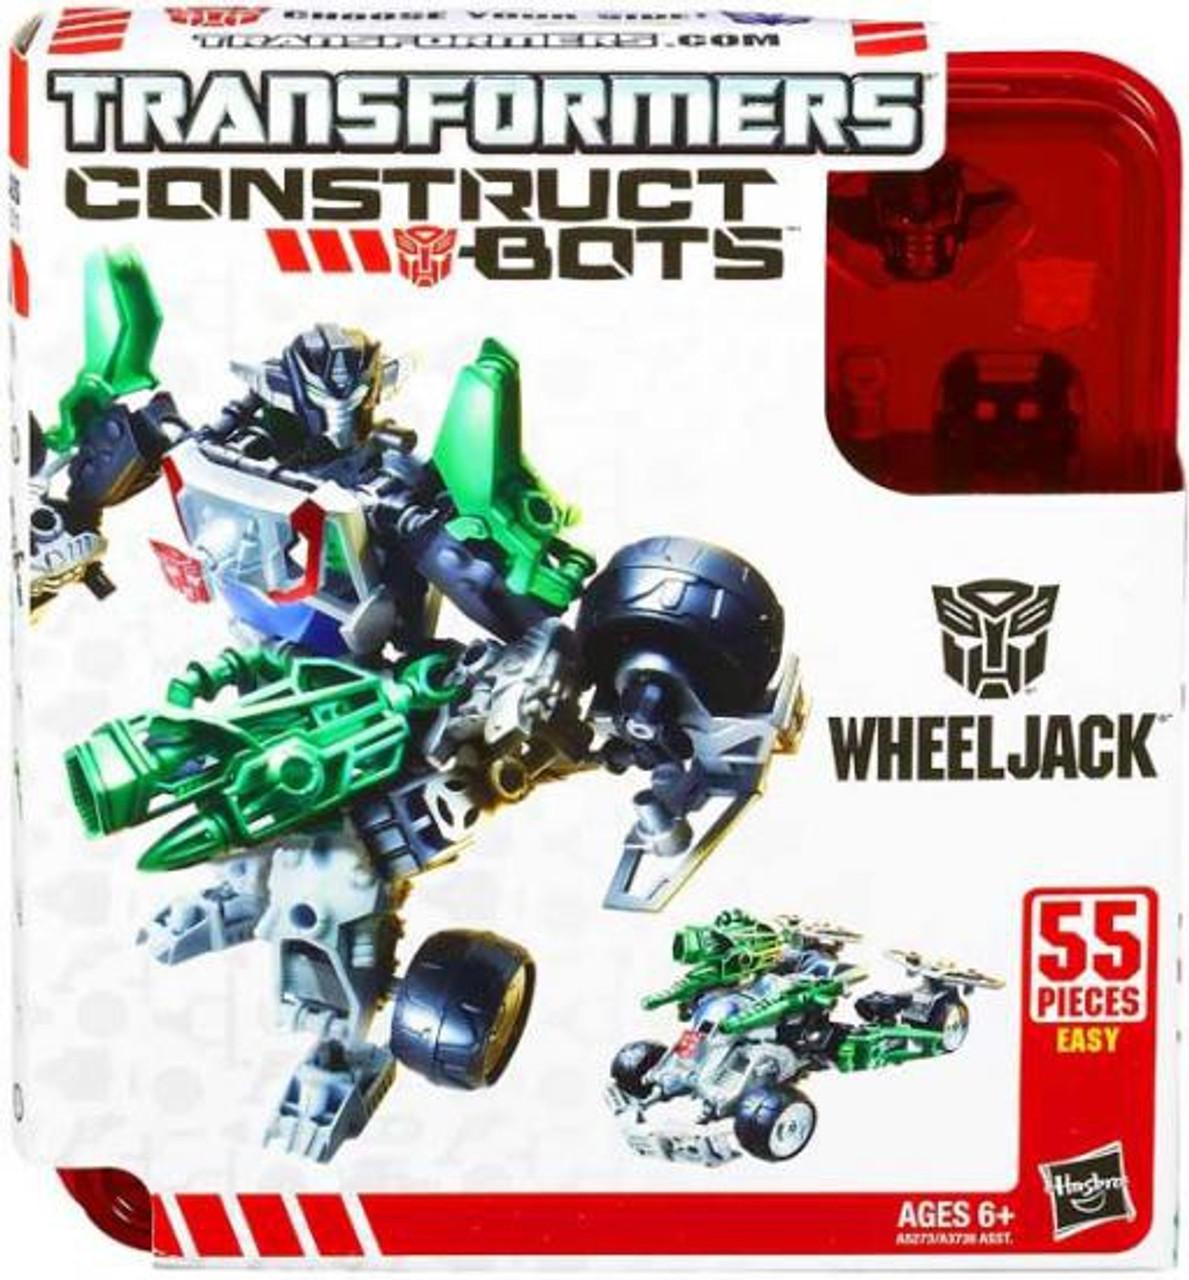 Transformers Construct-A-Bots Wheeljack Action Figure